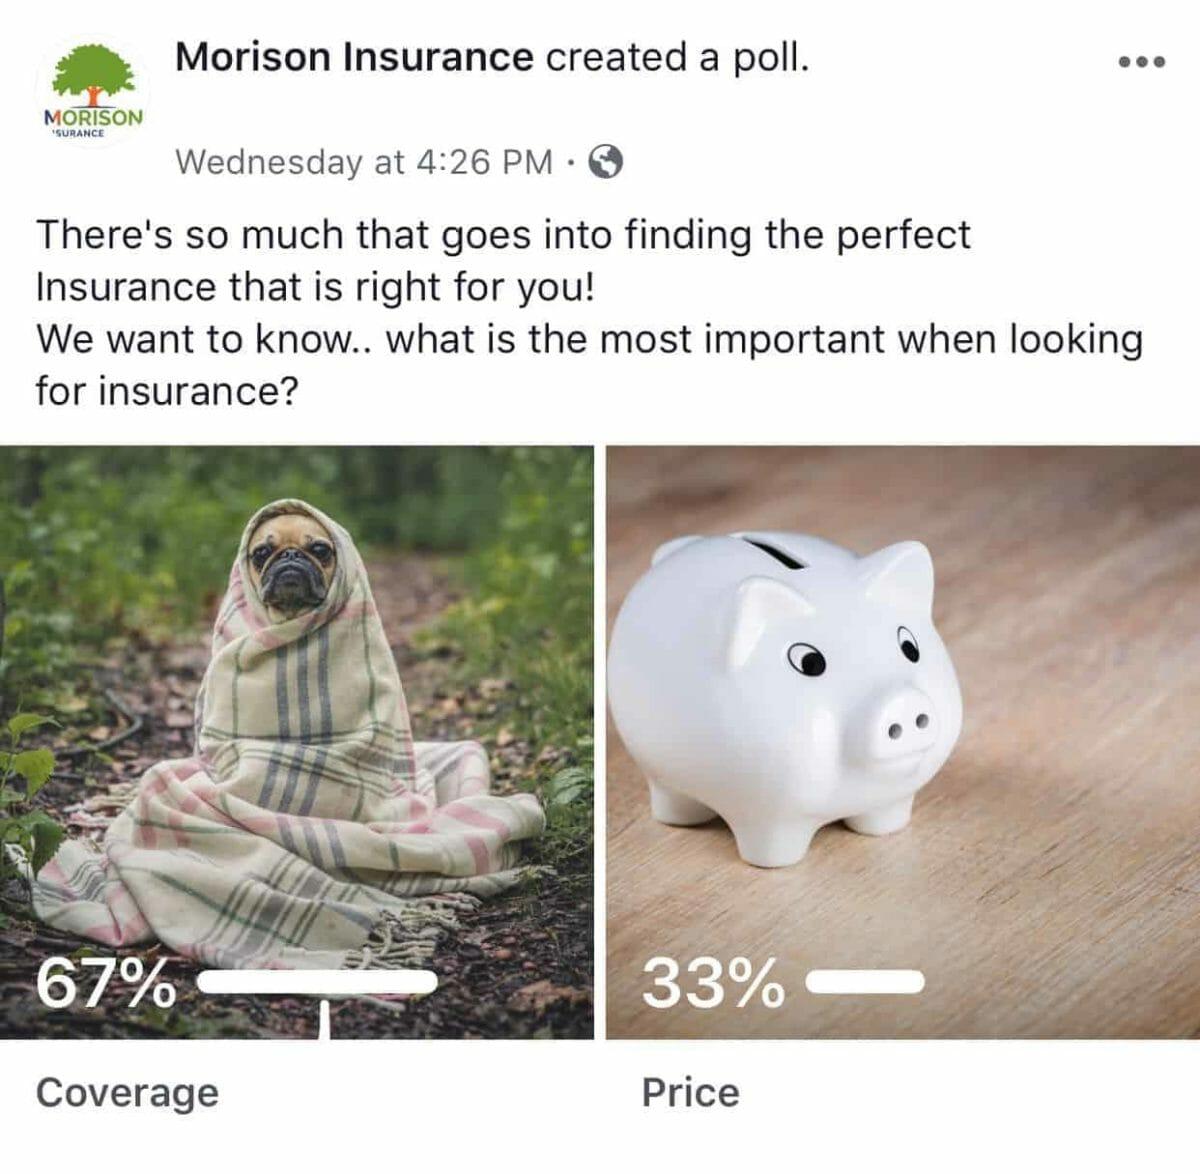 Morison-Insurance-Facebook-Poll-Best-Insurance-Coverage